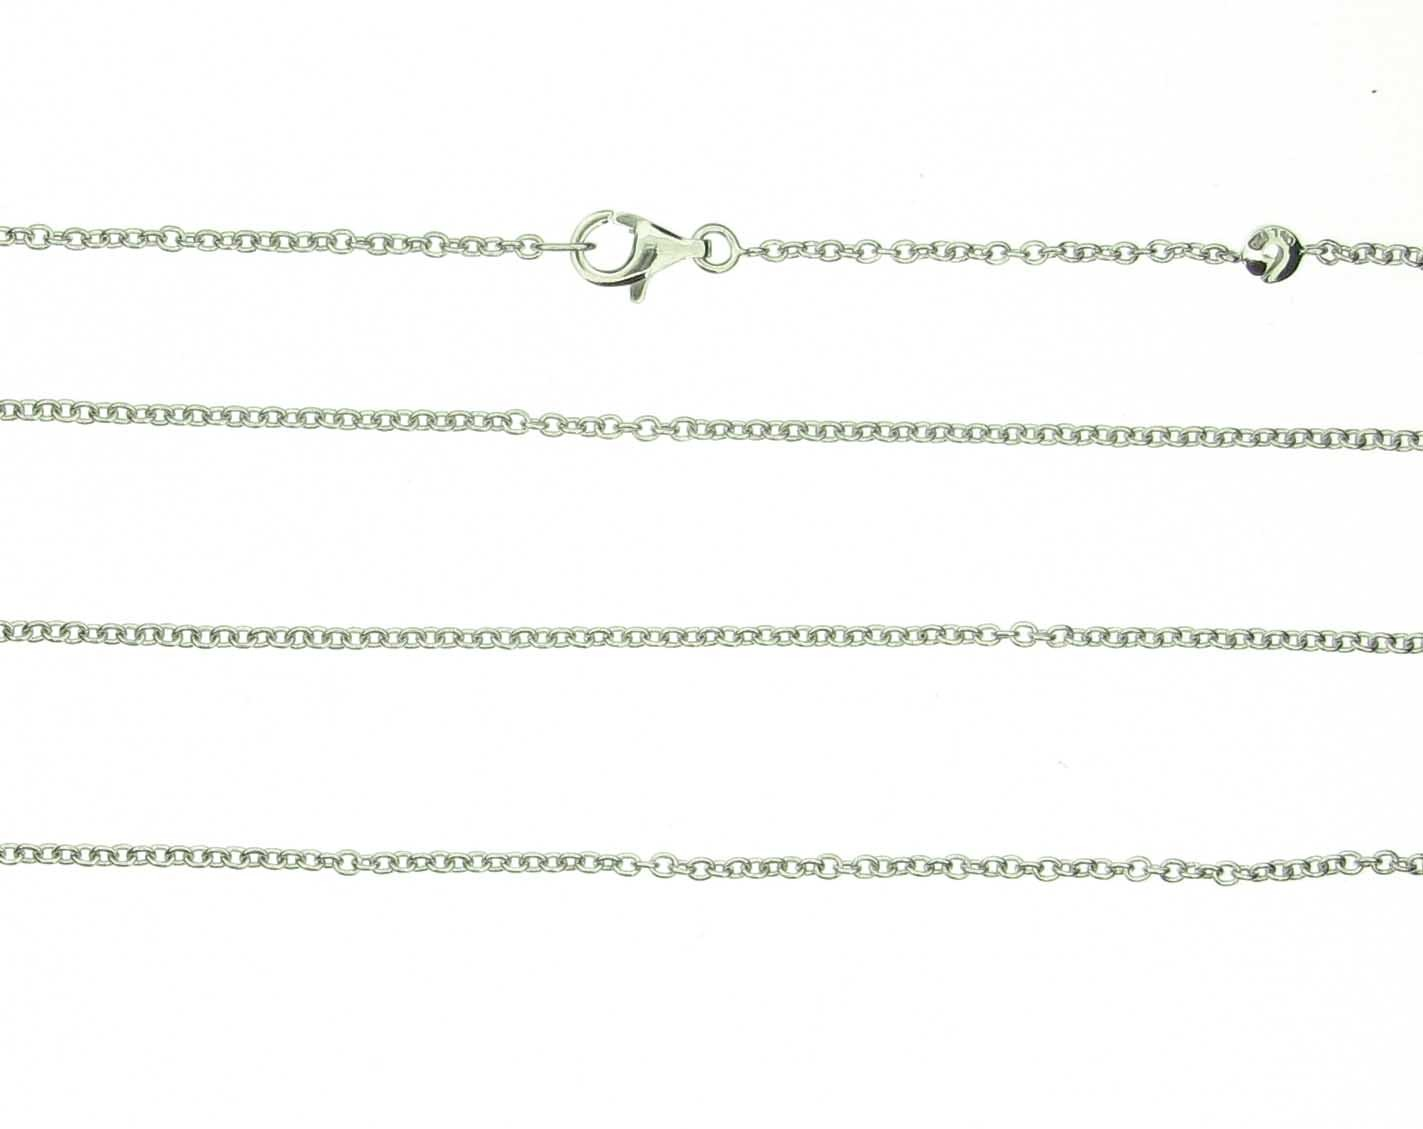 Kette 80cm 18ct Weißgold - Ole Lynggaard - C2017-501